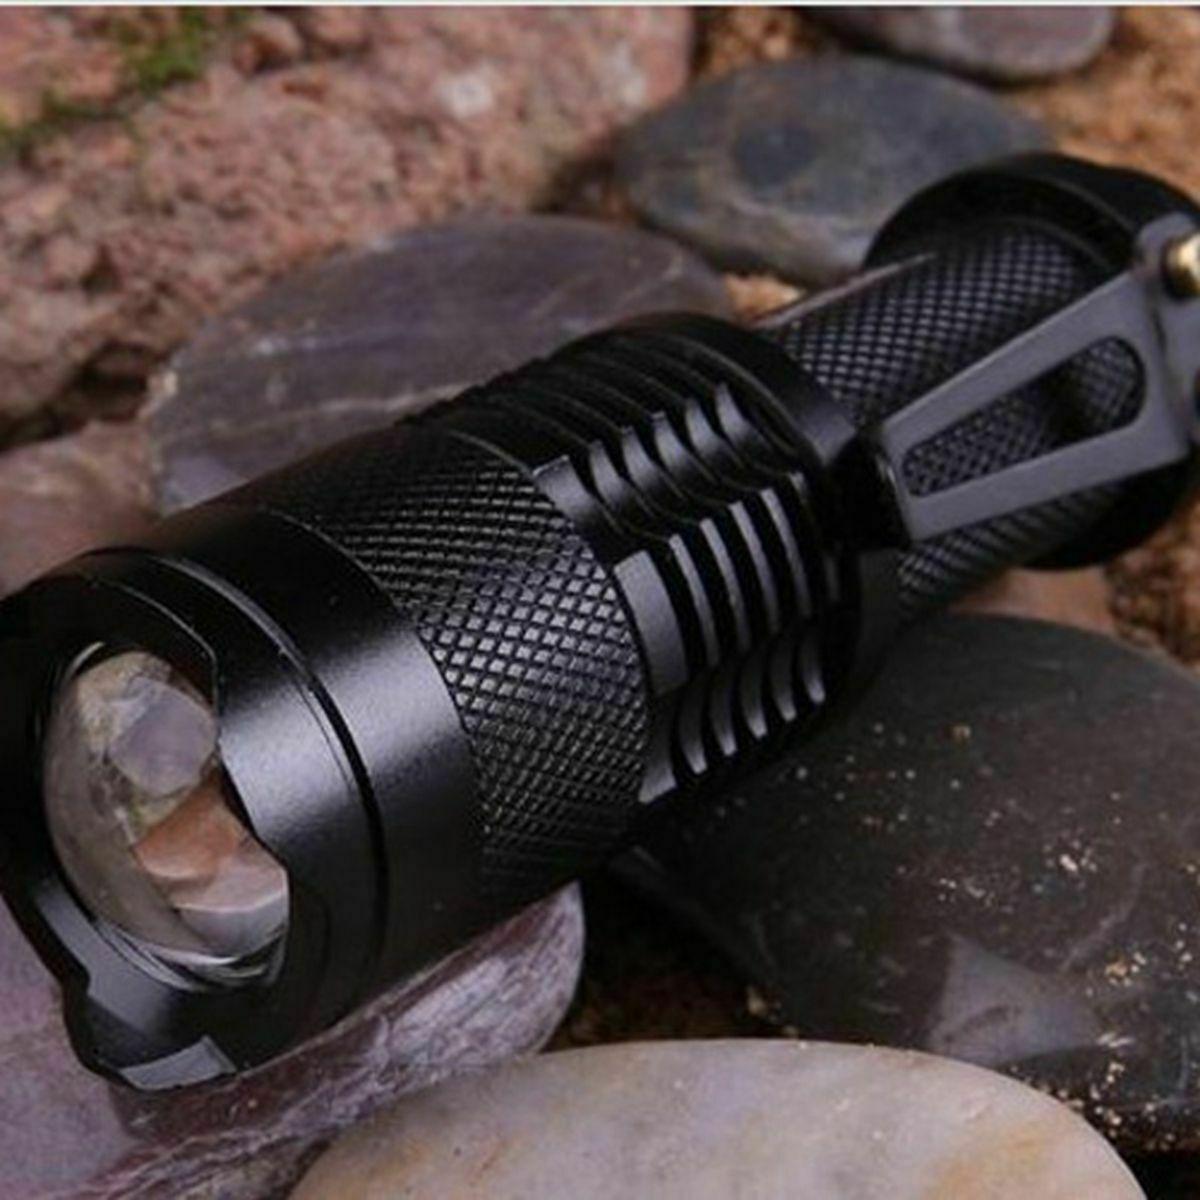 6PCS Mini CREE Q5 LED Flashlight Torch 1200LM Adjustable Focus Zoom Light Lamp Camping & Hiking